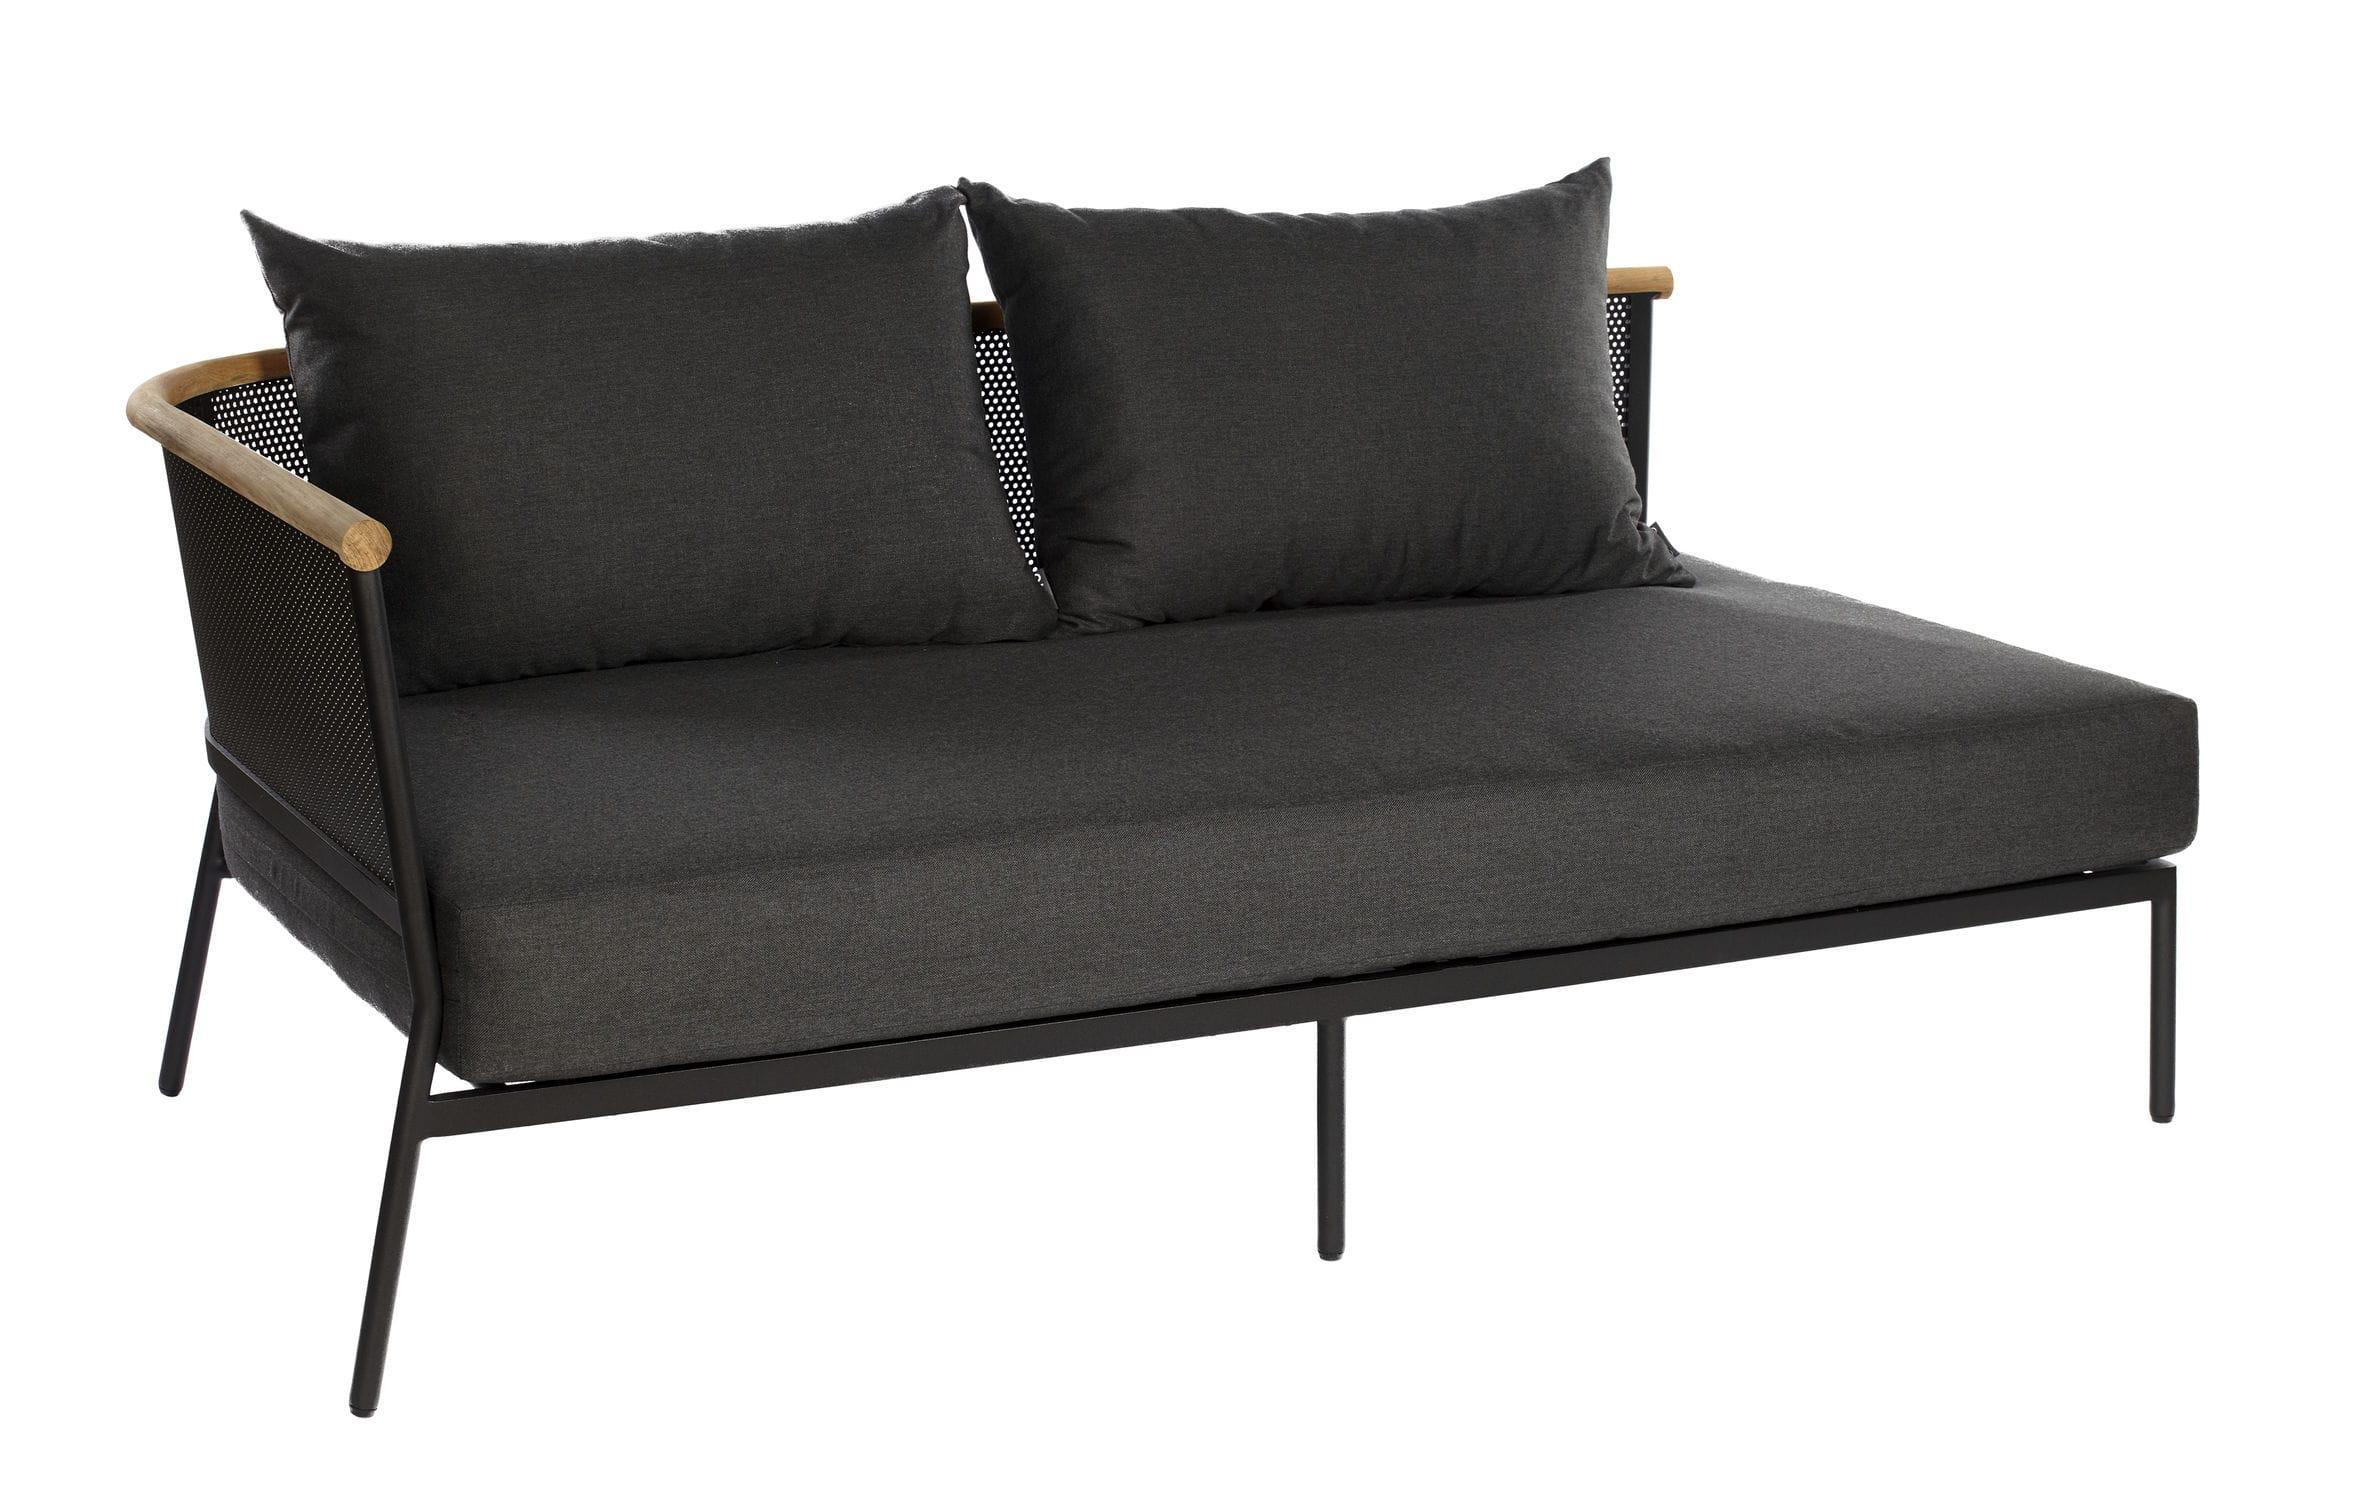 Modular sofa contemporary outdoor Sunbrella RIAD OASIQ